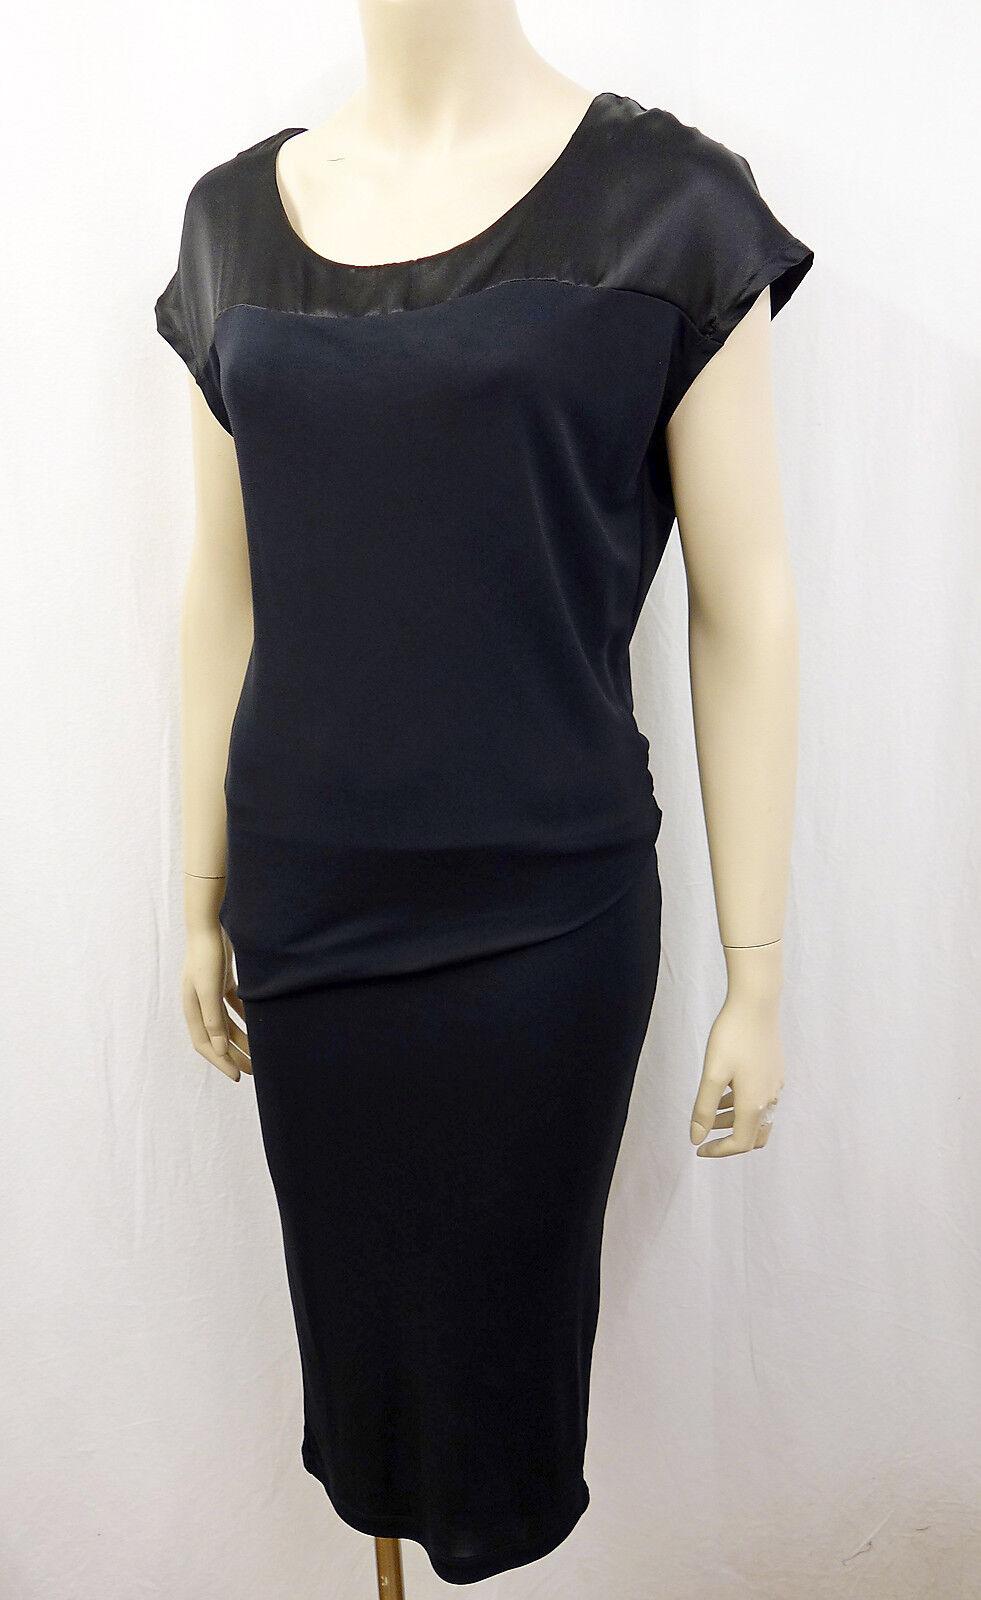 Nouveau IHEART Designer Robe Dress Größe XS 34-36 personnage souligne schwarz